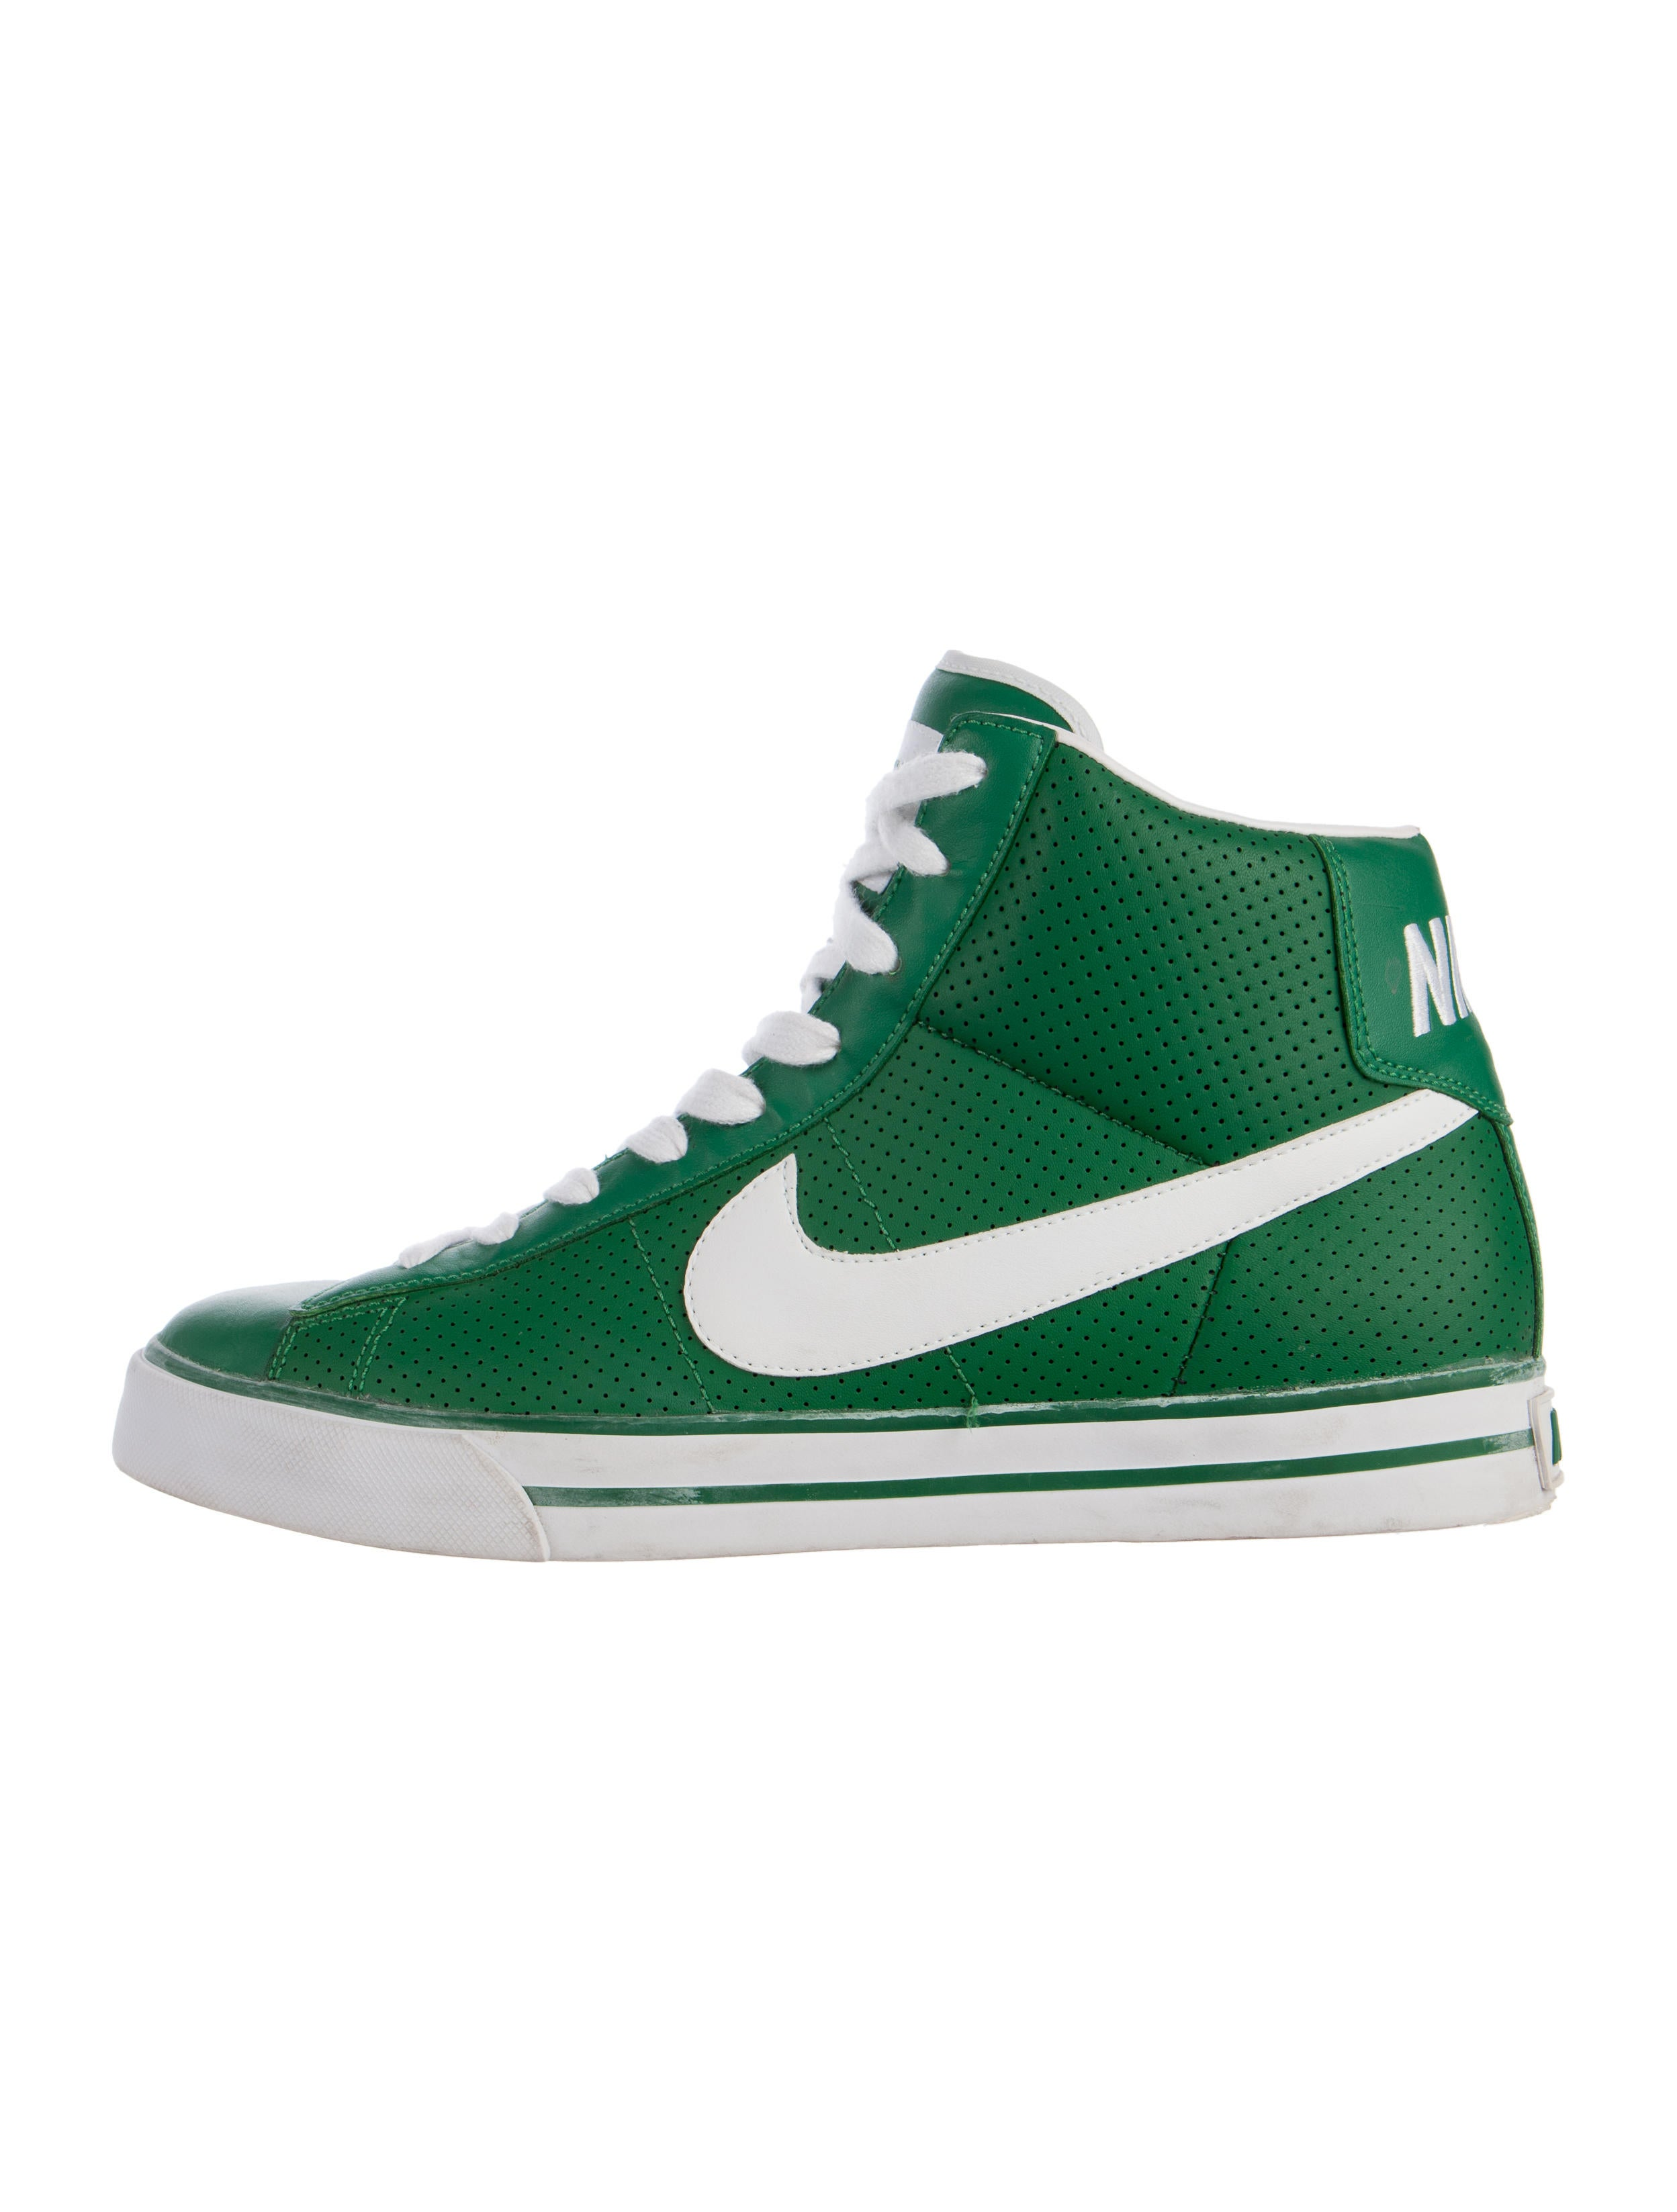 79ac14e9e Nike BRS High-Top Sneakers - Shoes - WU221161